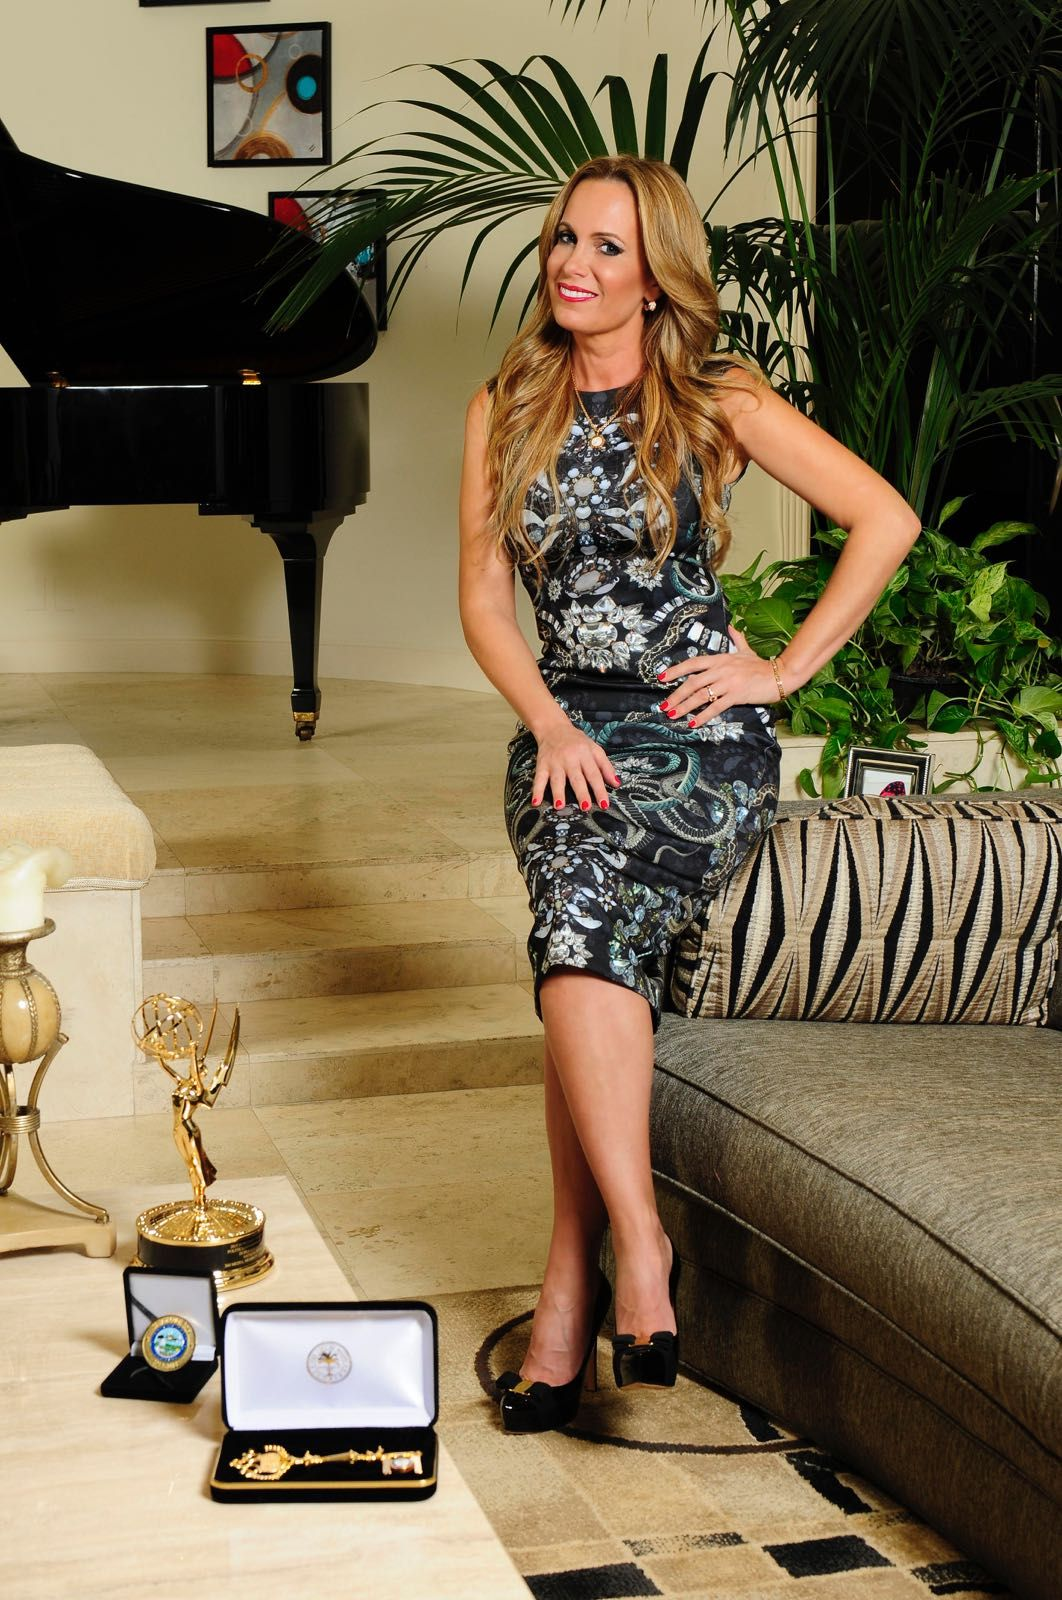 Natalia Denegri, doblemente nominada al Emmy Awards